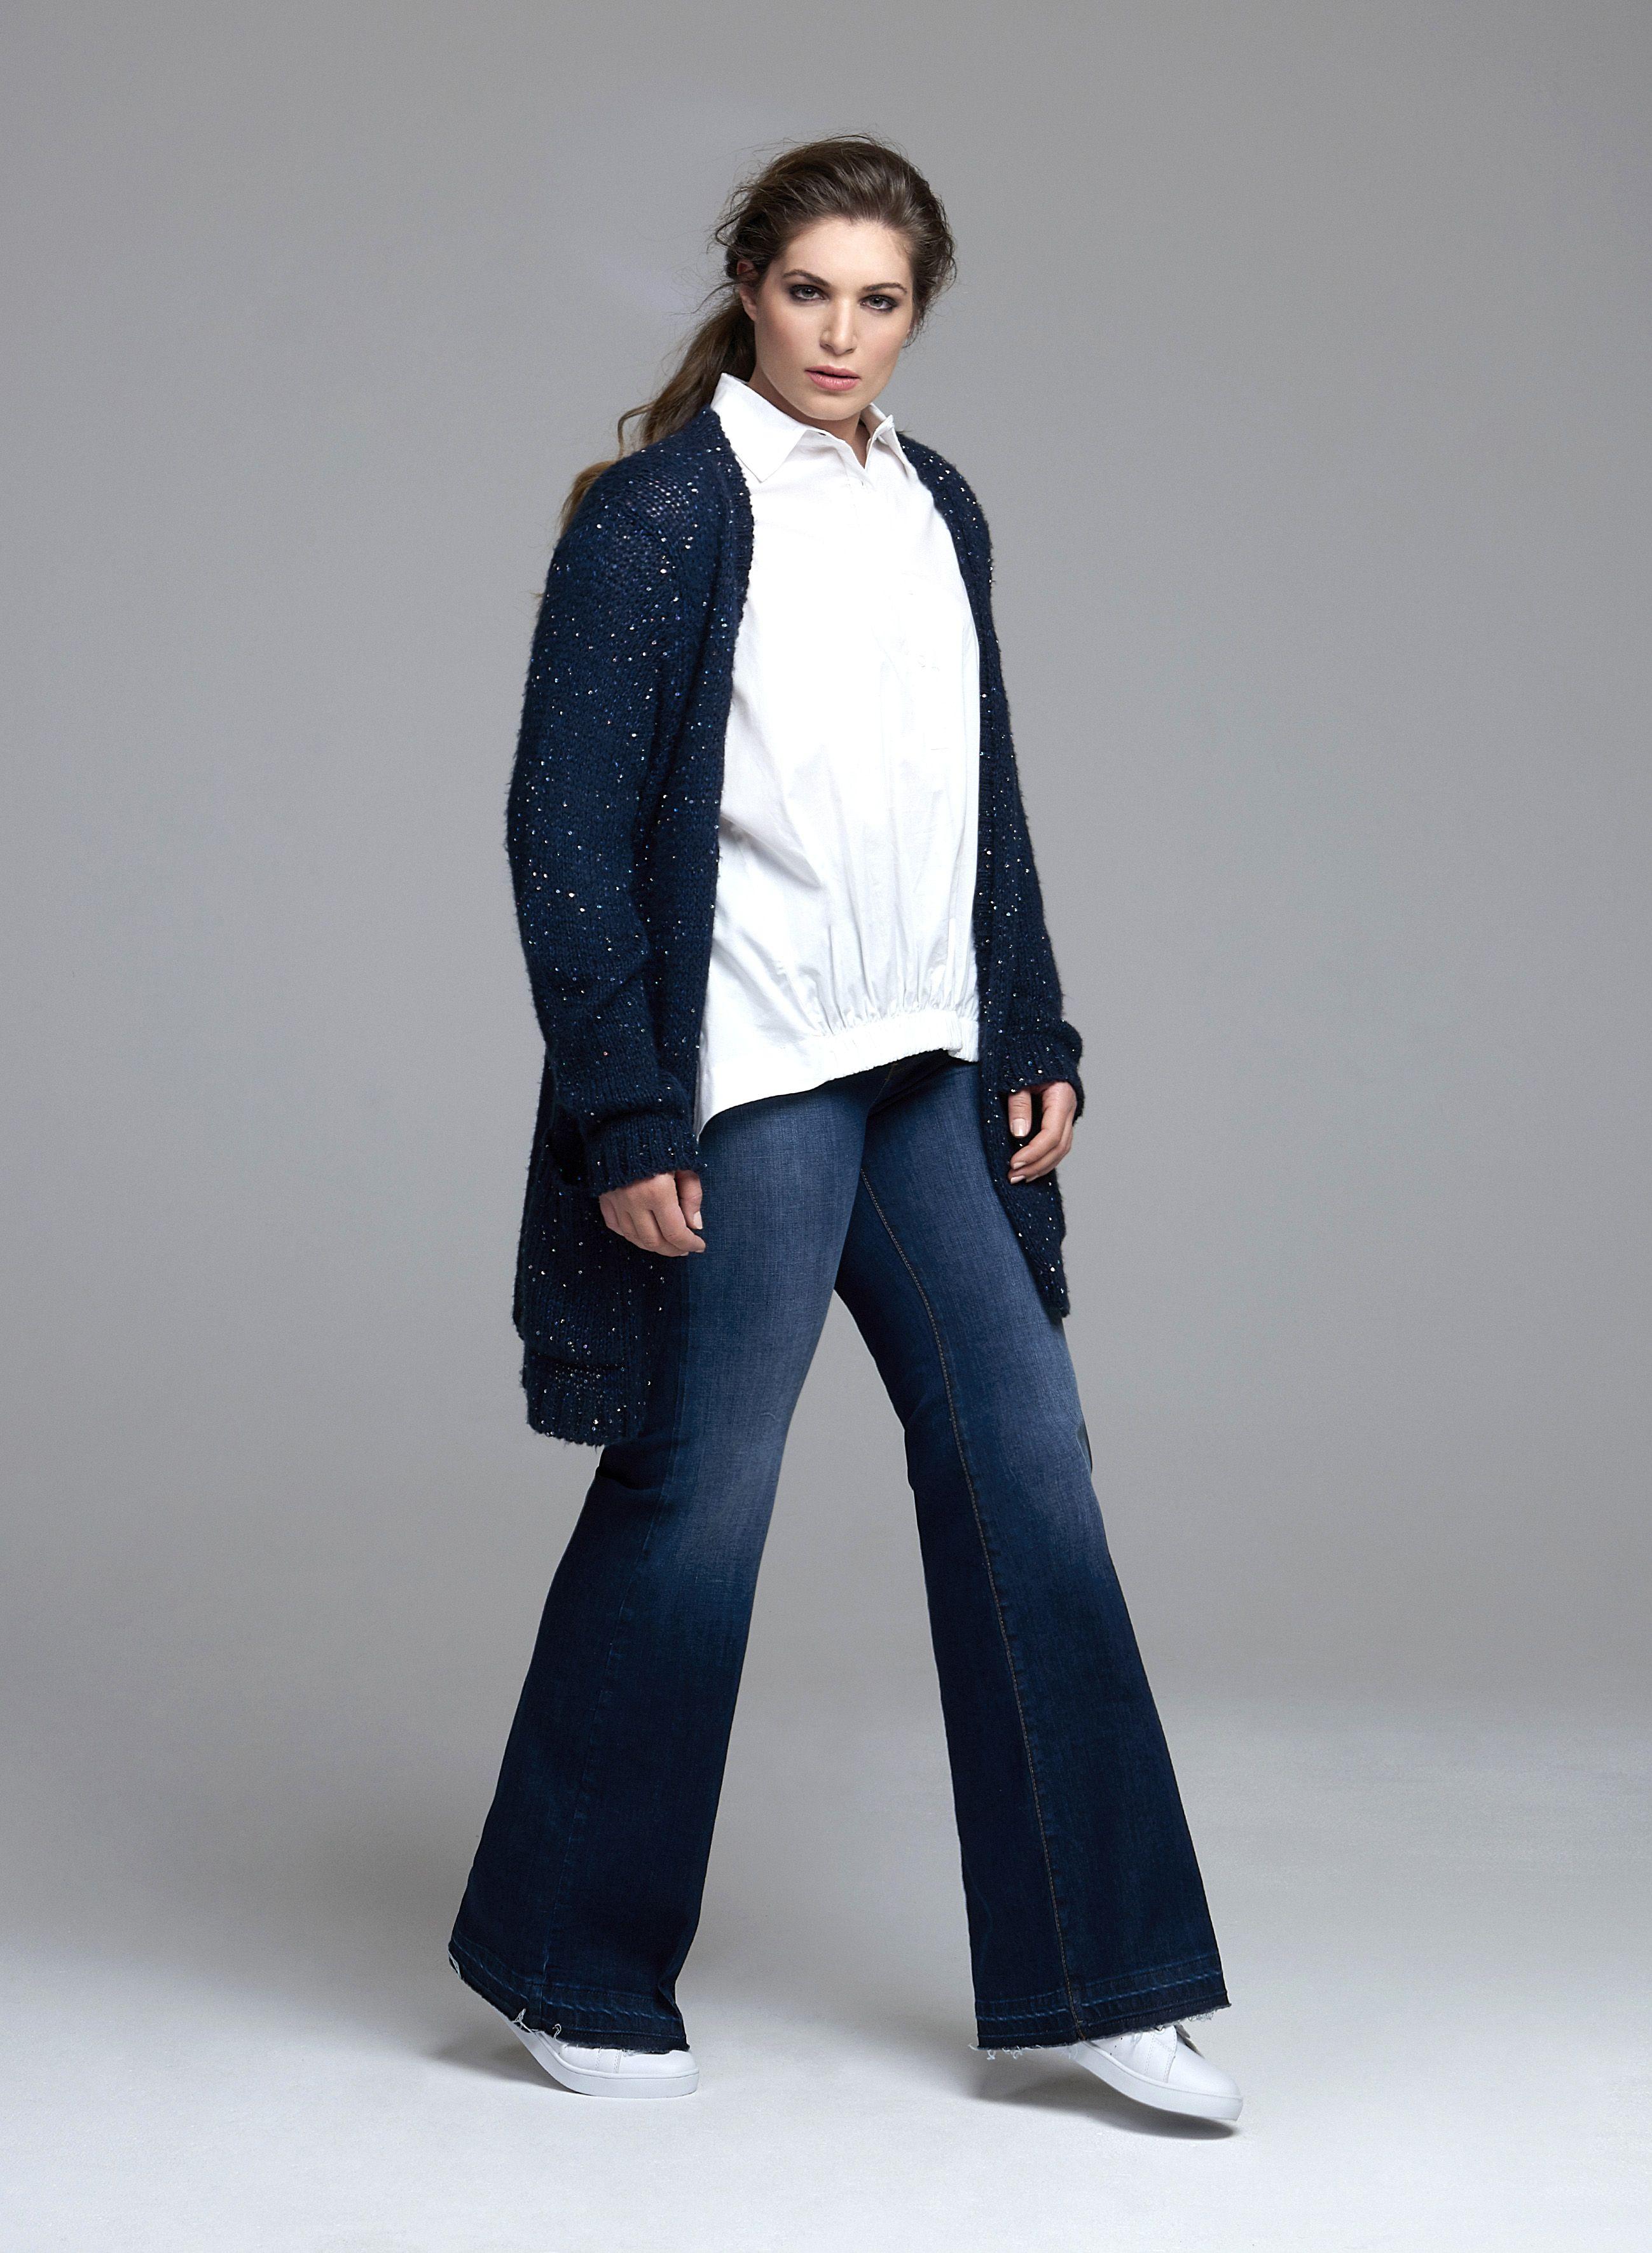 Urban Nobility    MAT FASHION F W 17-18  matfashion  fw1718  realsize   fashion  plussizefashion f3db5b1d3bd